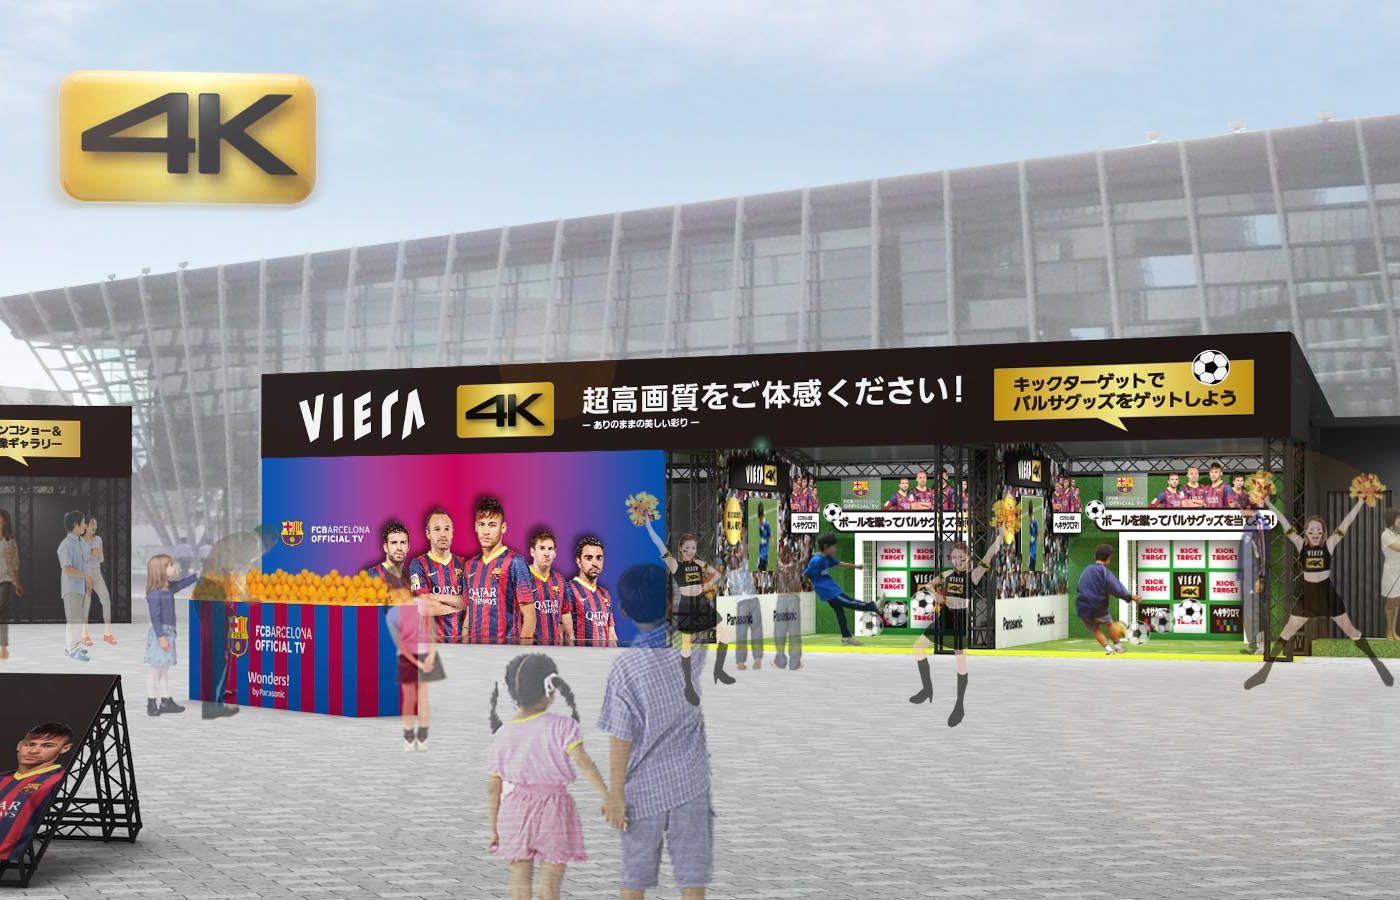 「4K体感フェスタ」グランフロント大阪 うめきた広場開催イメージ